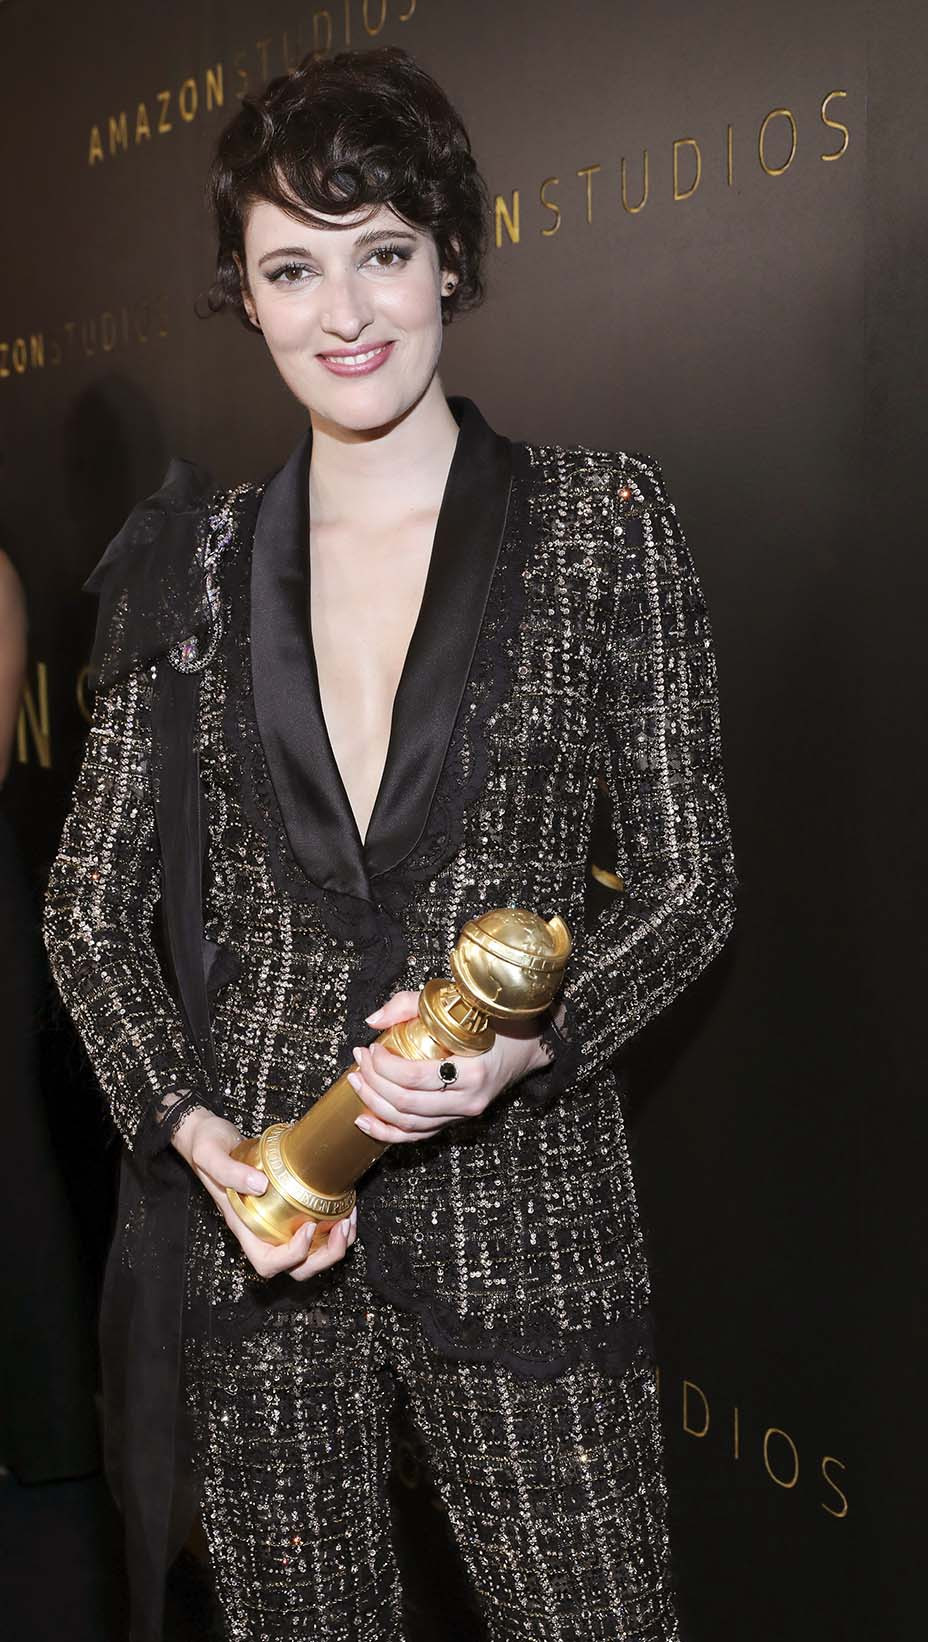 Phoebe Waller Bridge Auctions Golden Globes Tuxedo On Ebay To Aid Australia Fires Hollywood Reporter